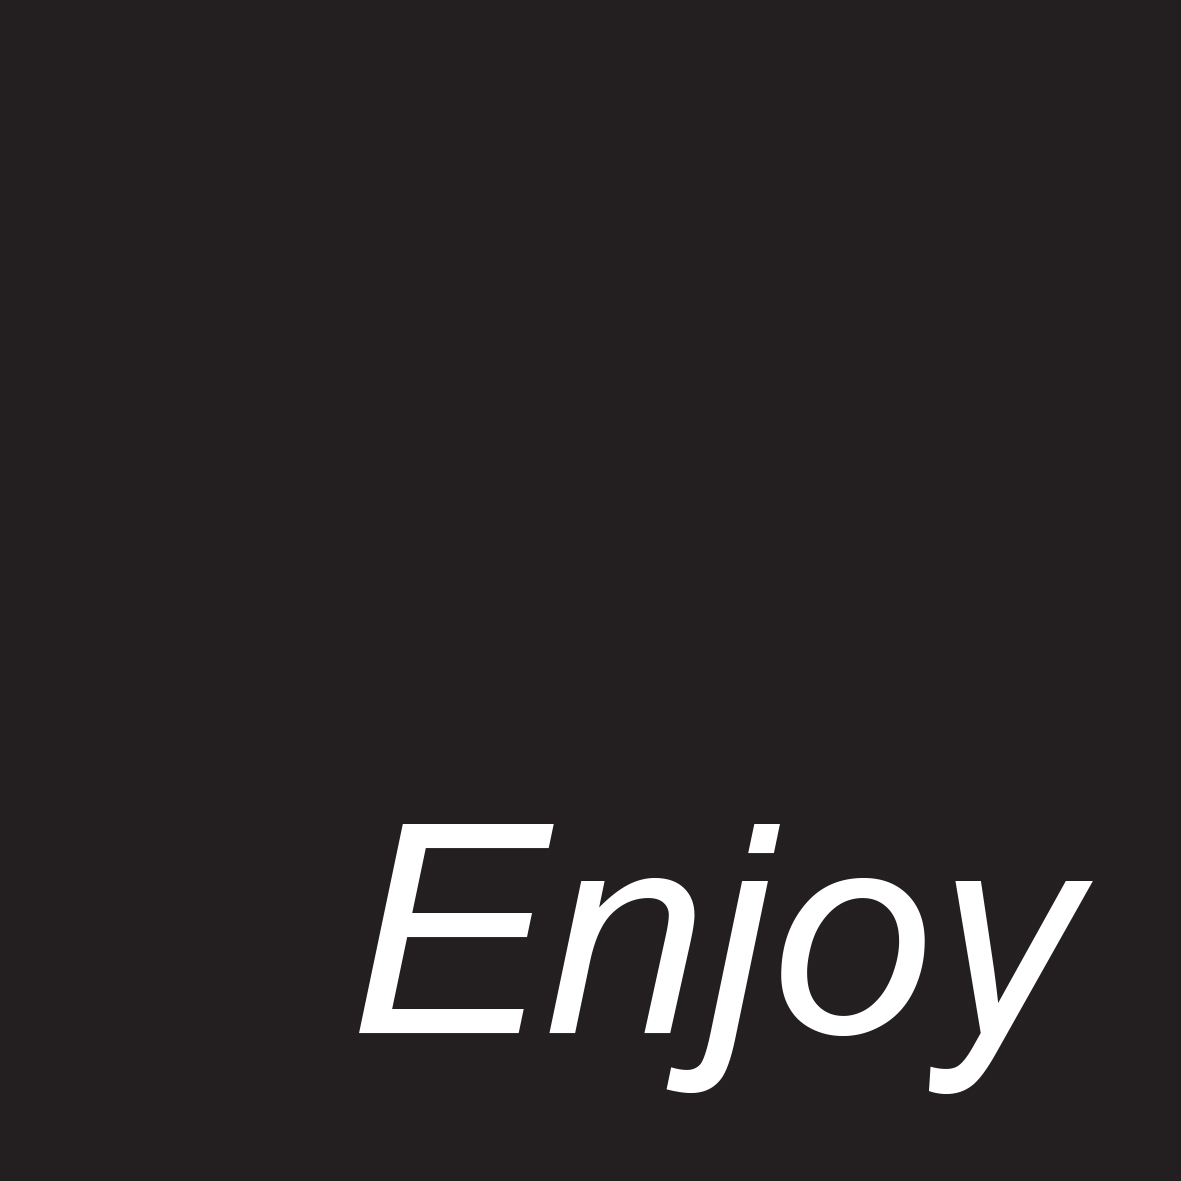 EnjoyLogoMaster.jpg